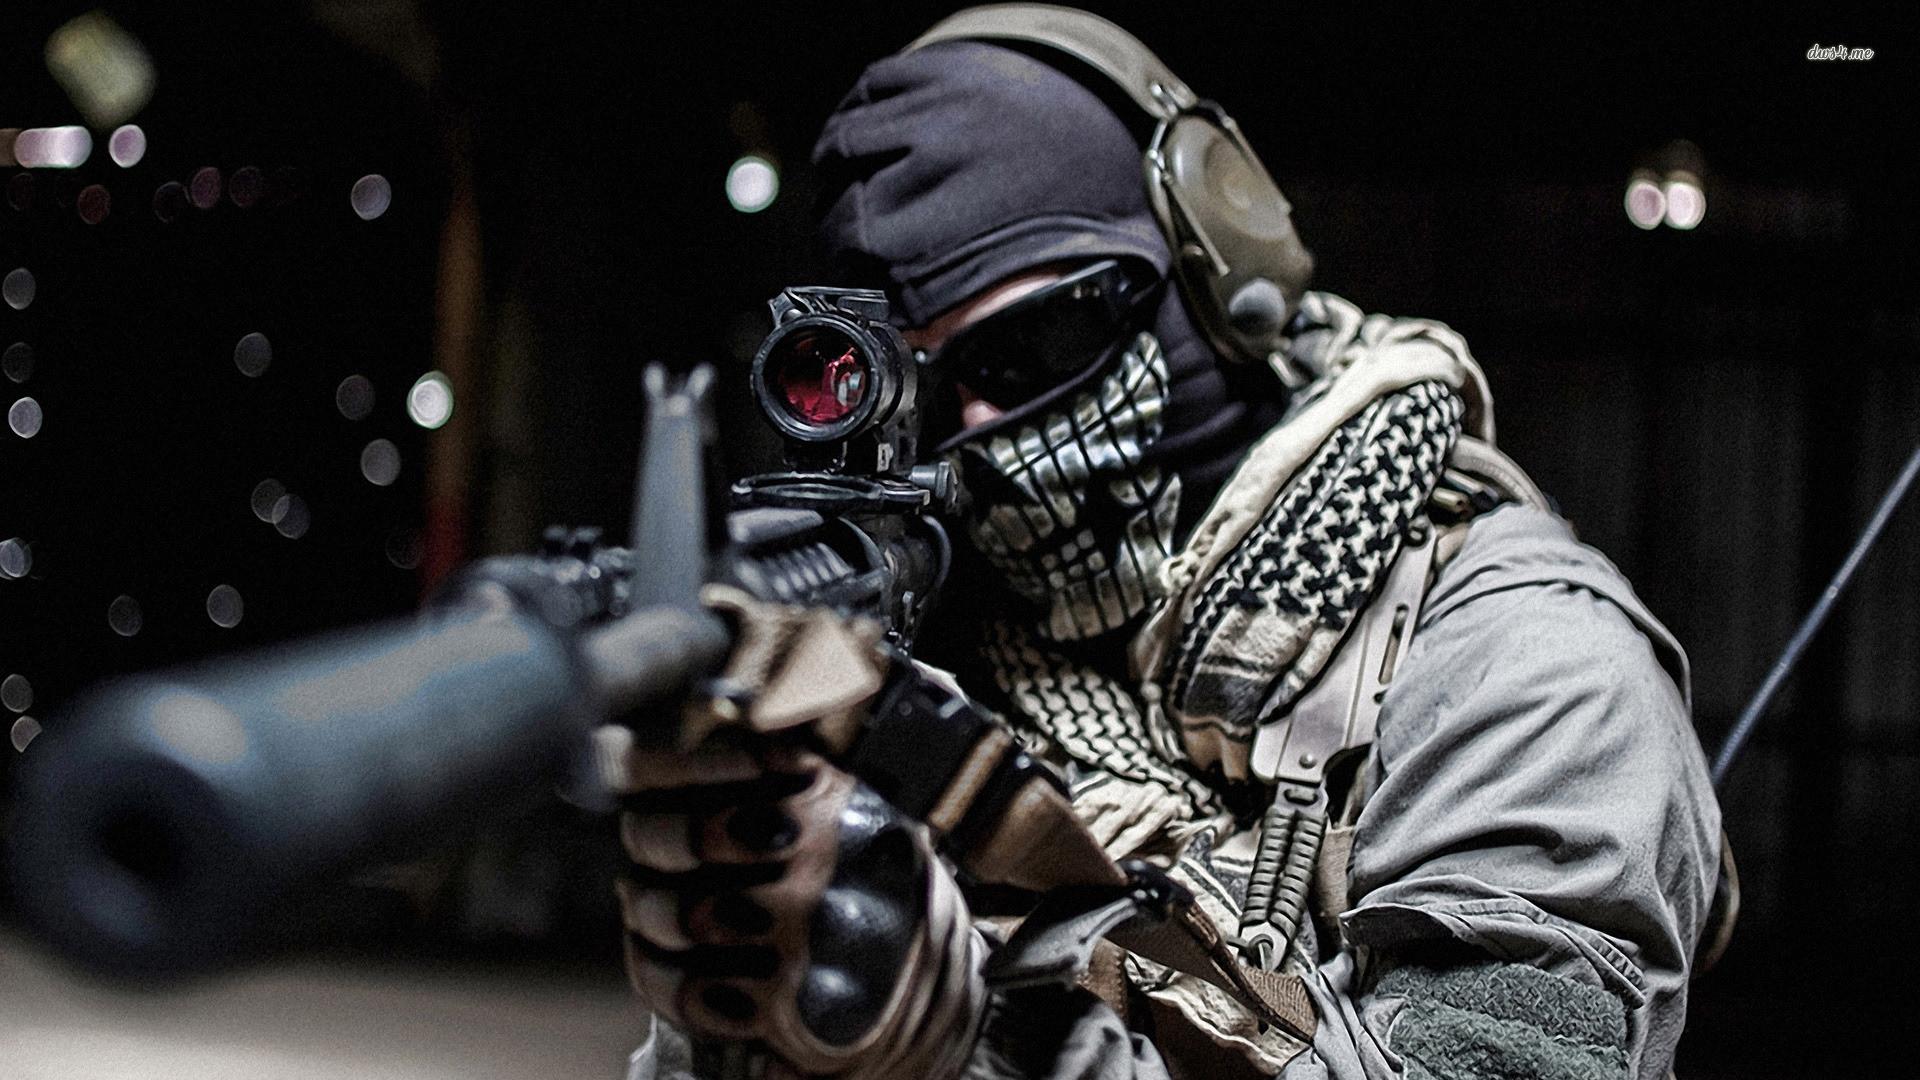 Call Of Duty Modern Warfare 2 Wallpapers Wallpapertag